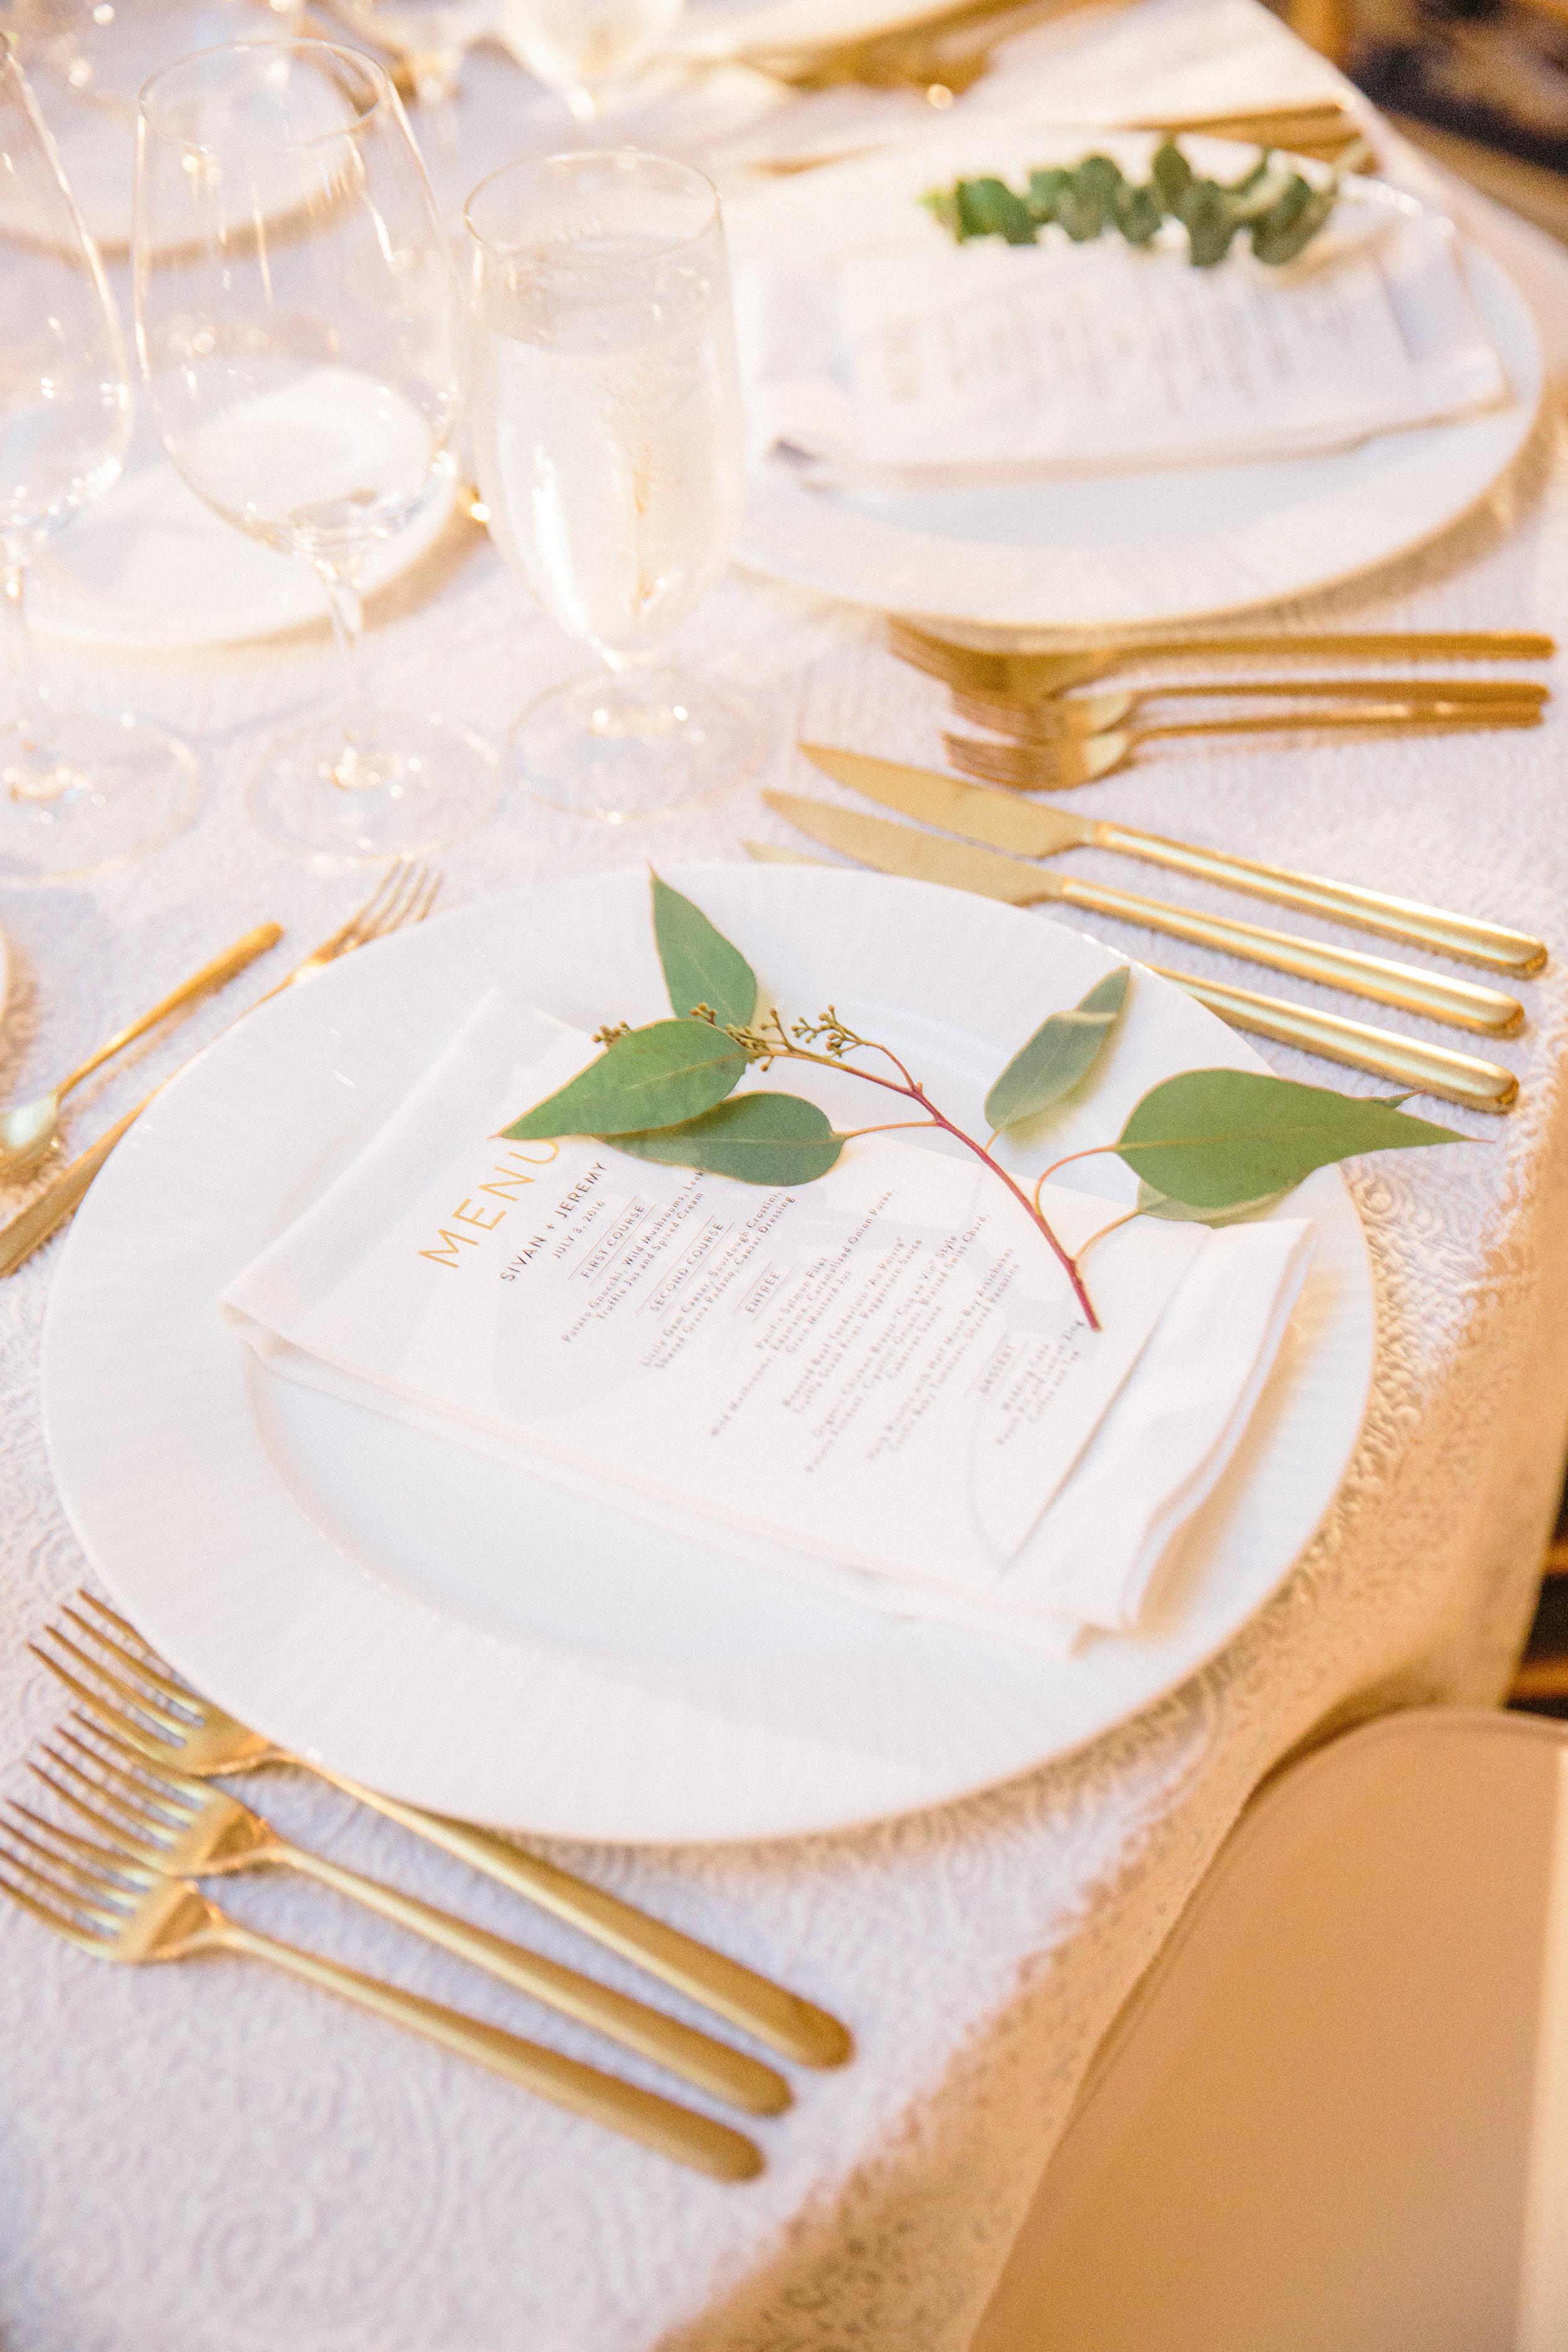 larissa-cleveland-sivanjeremy-wedding-0917-2.jpg